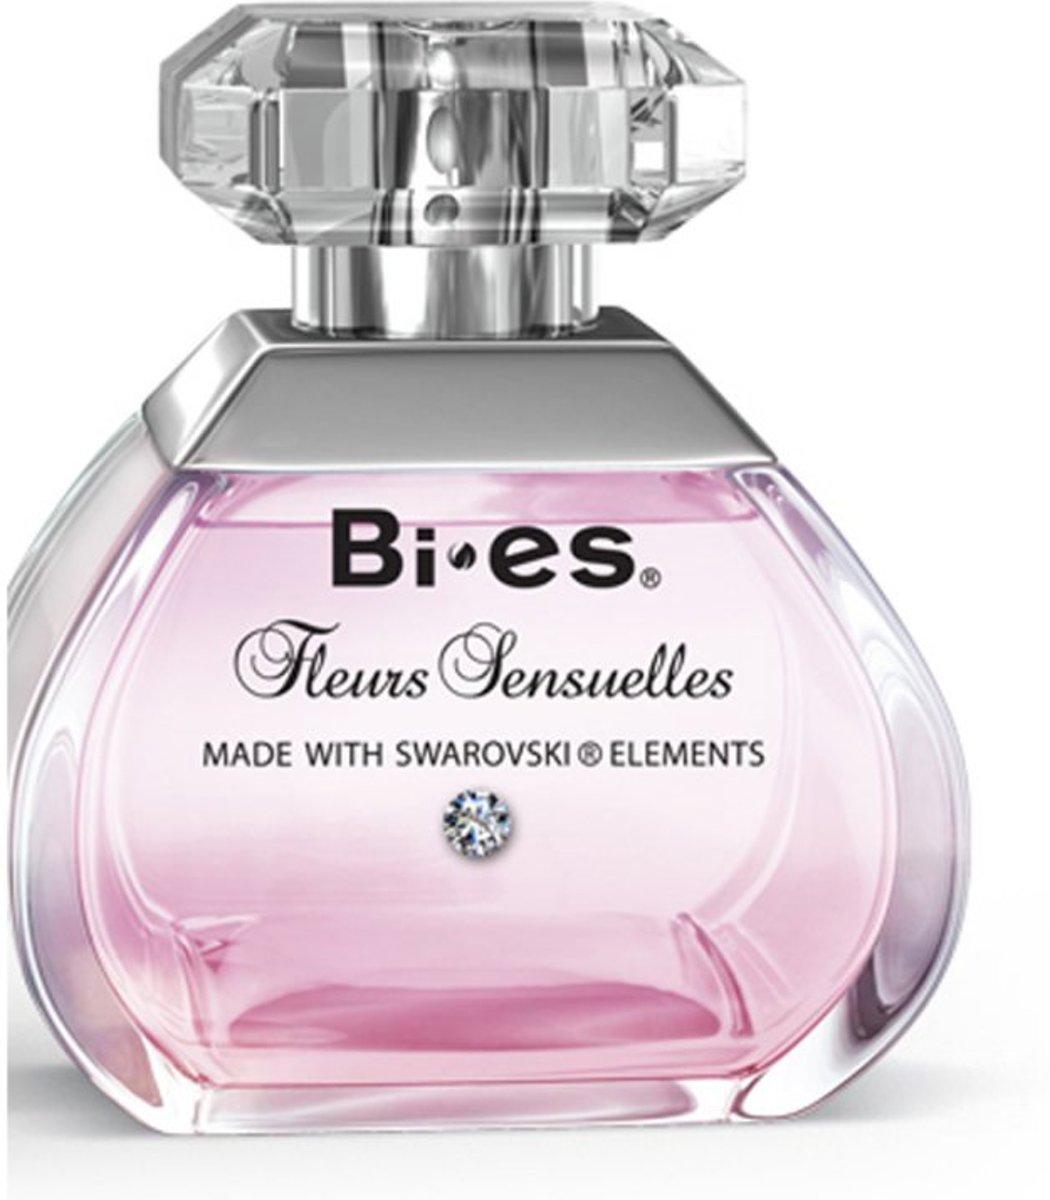 Foto van Bi.es Fleurs Sensuelles Eau de Parfum Spray 100 ml